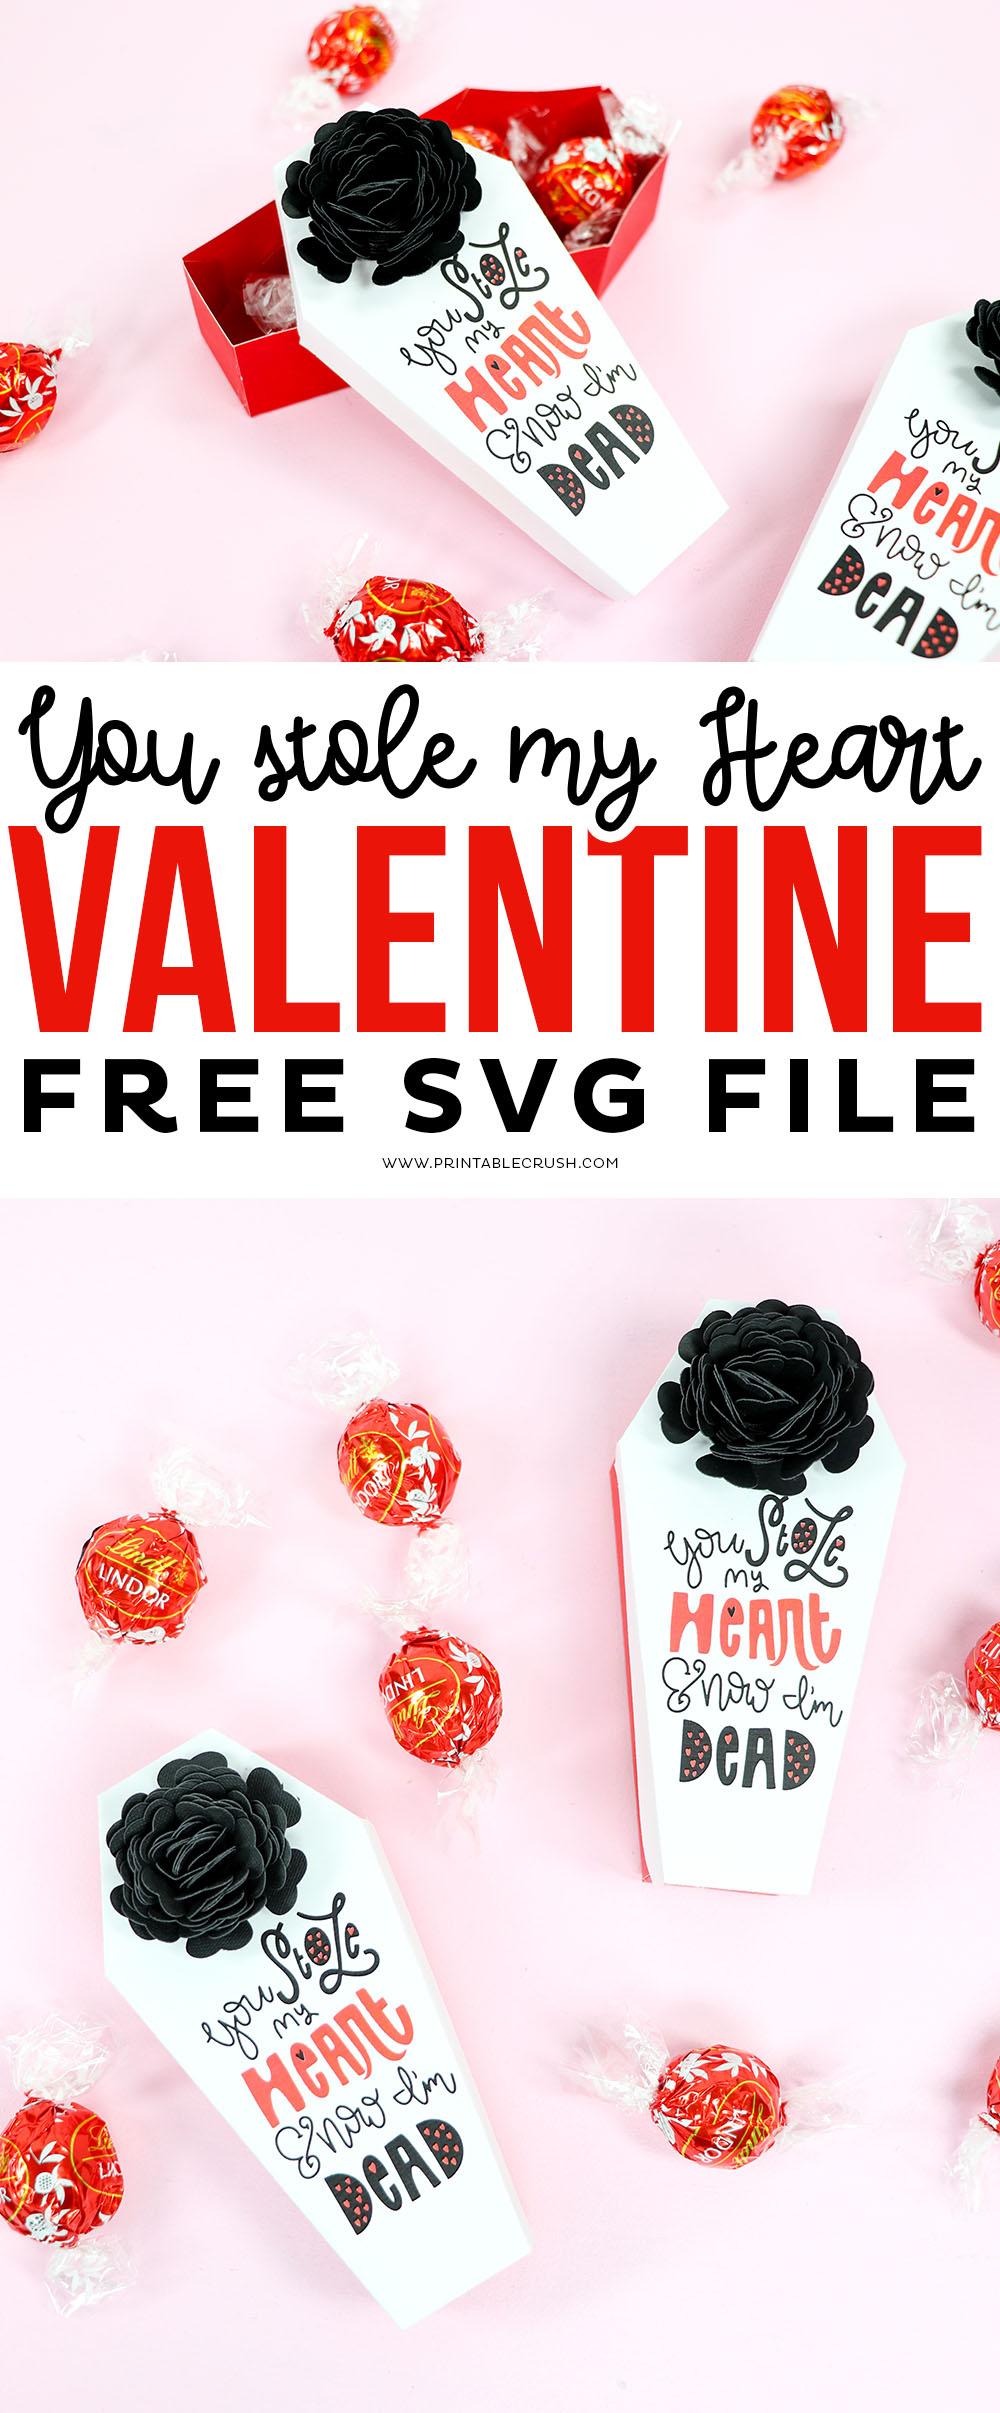 You Stole my Heart Valentine Free SVG File